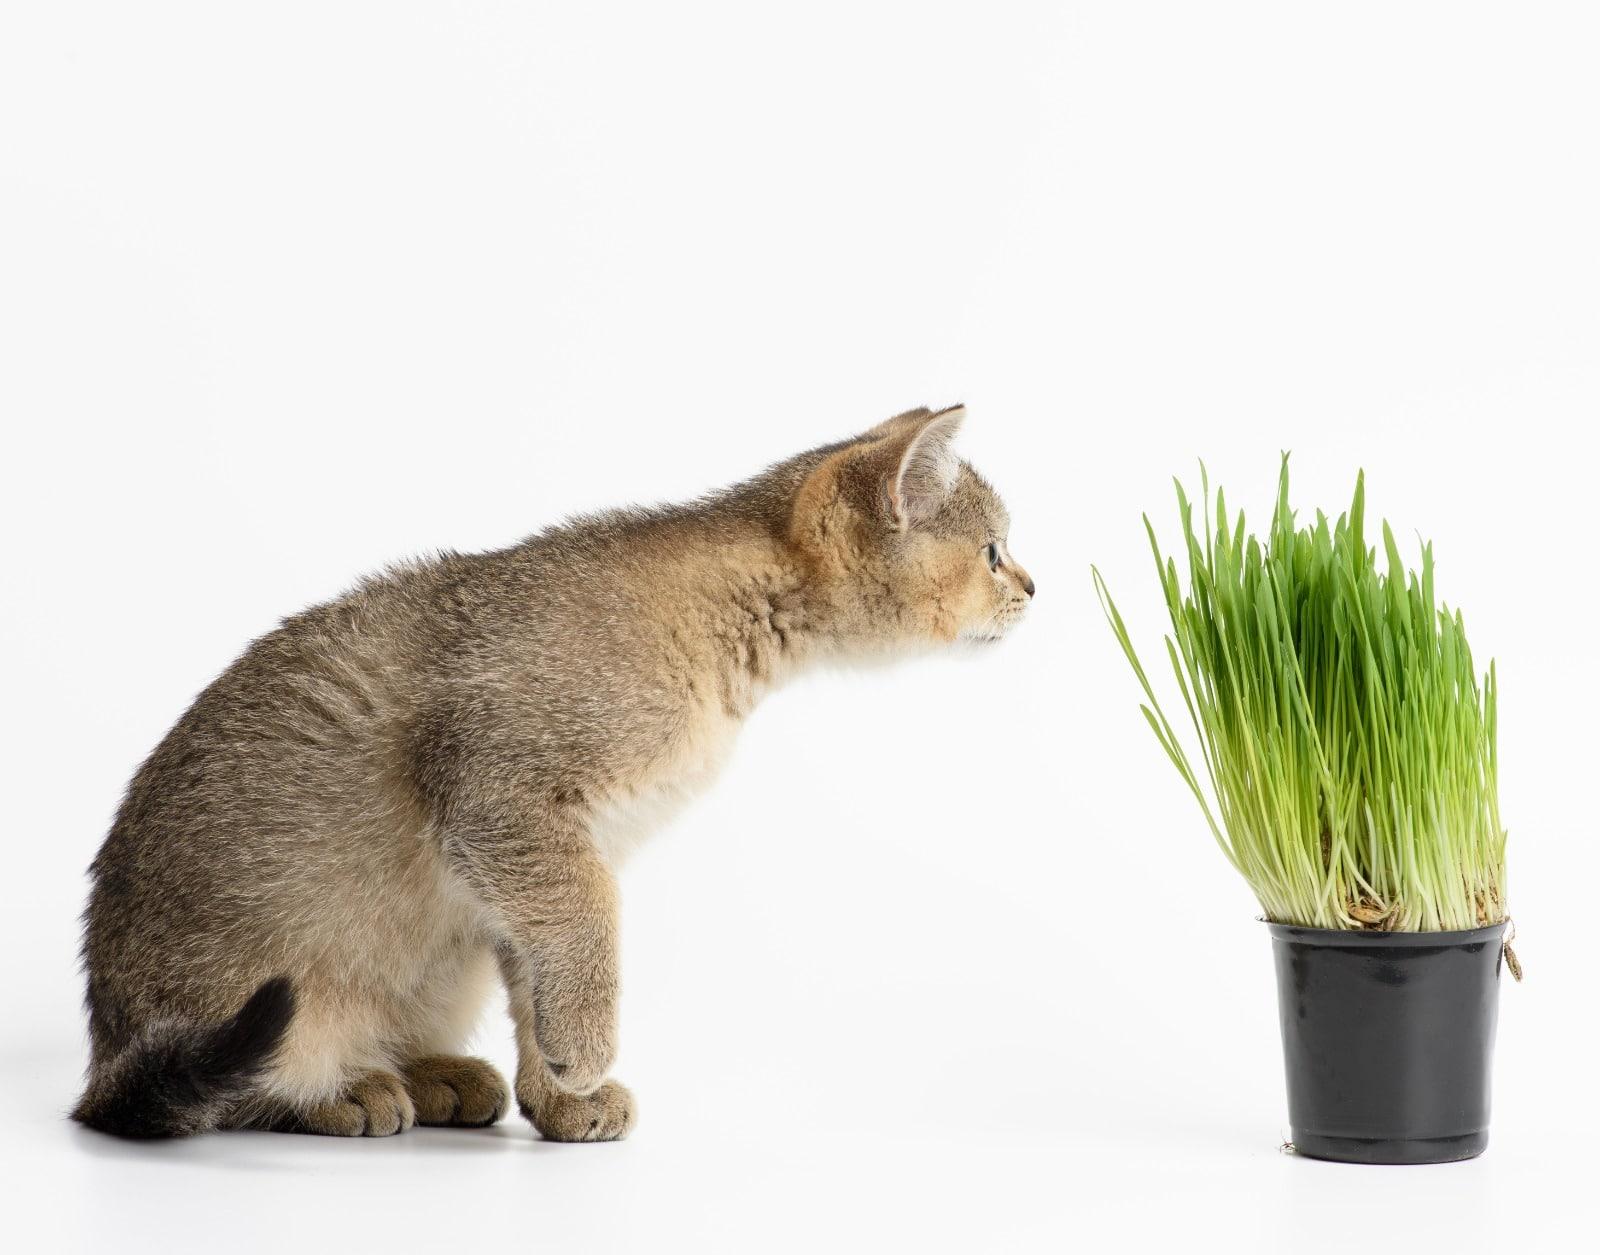 catnip o hierba para gatos